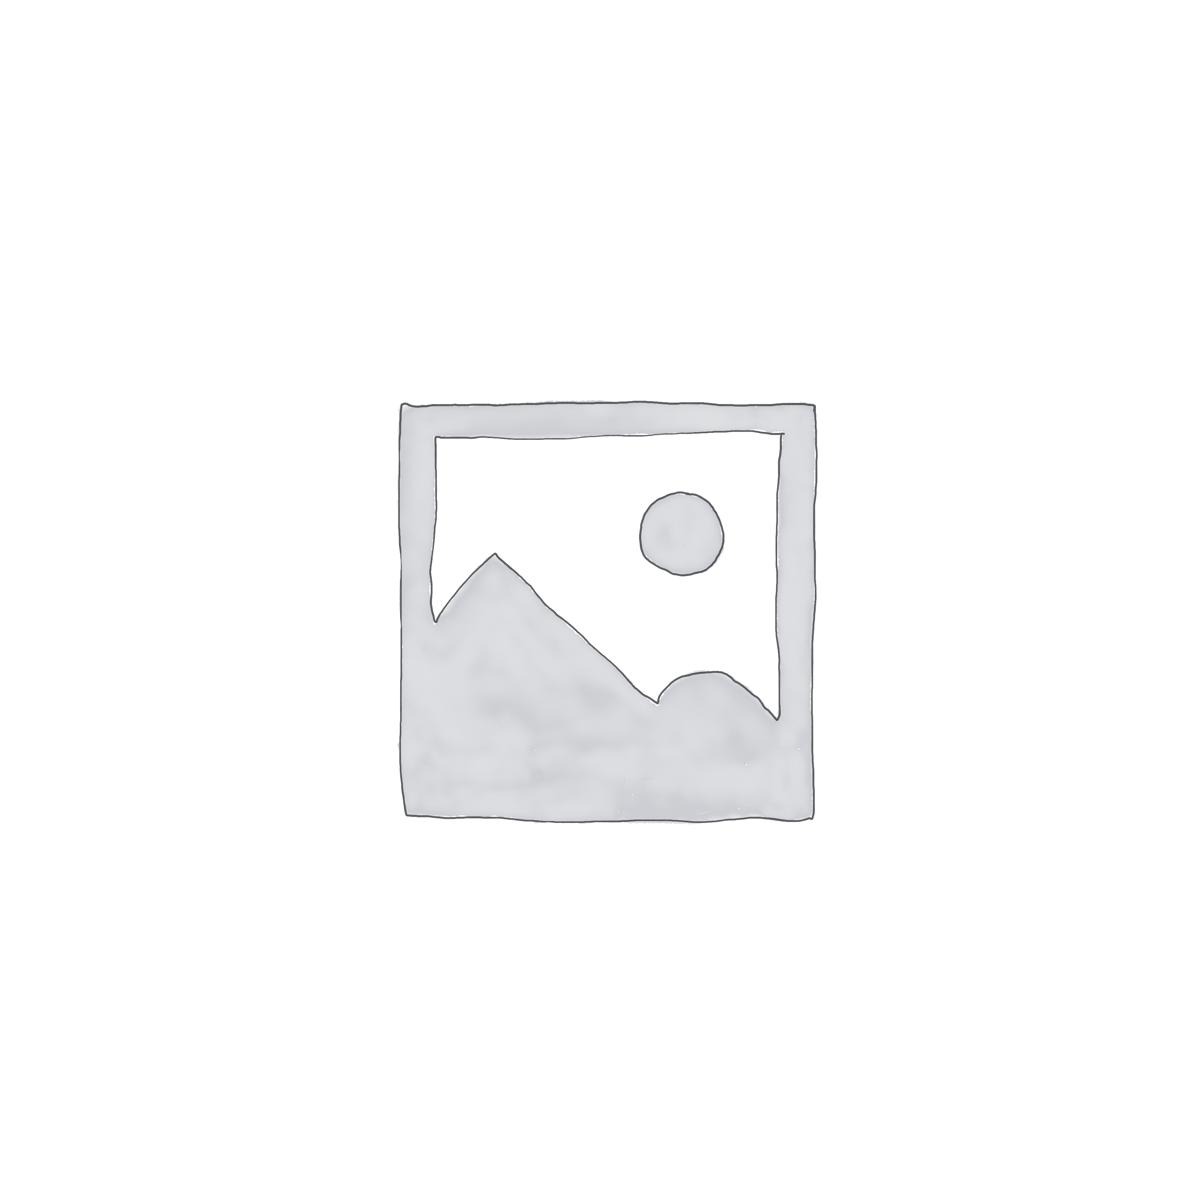 Black Yellow Geometric Shapes Wallpaper Mural